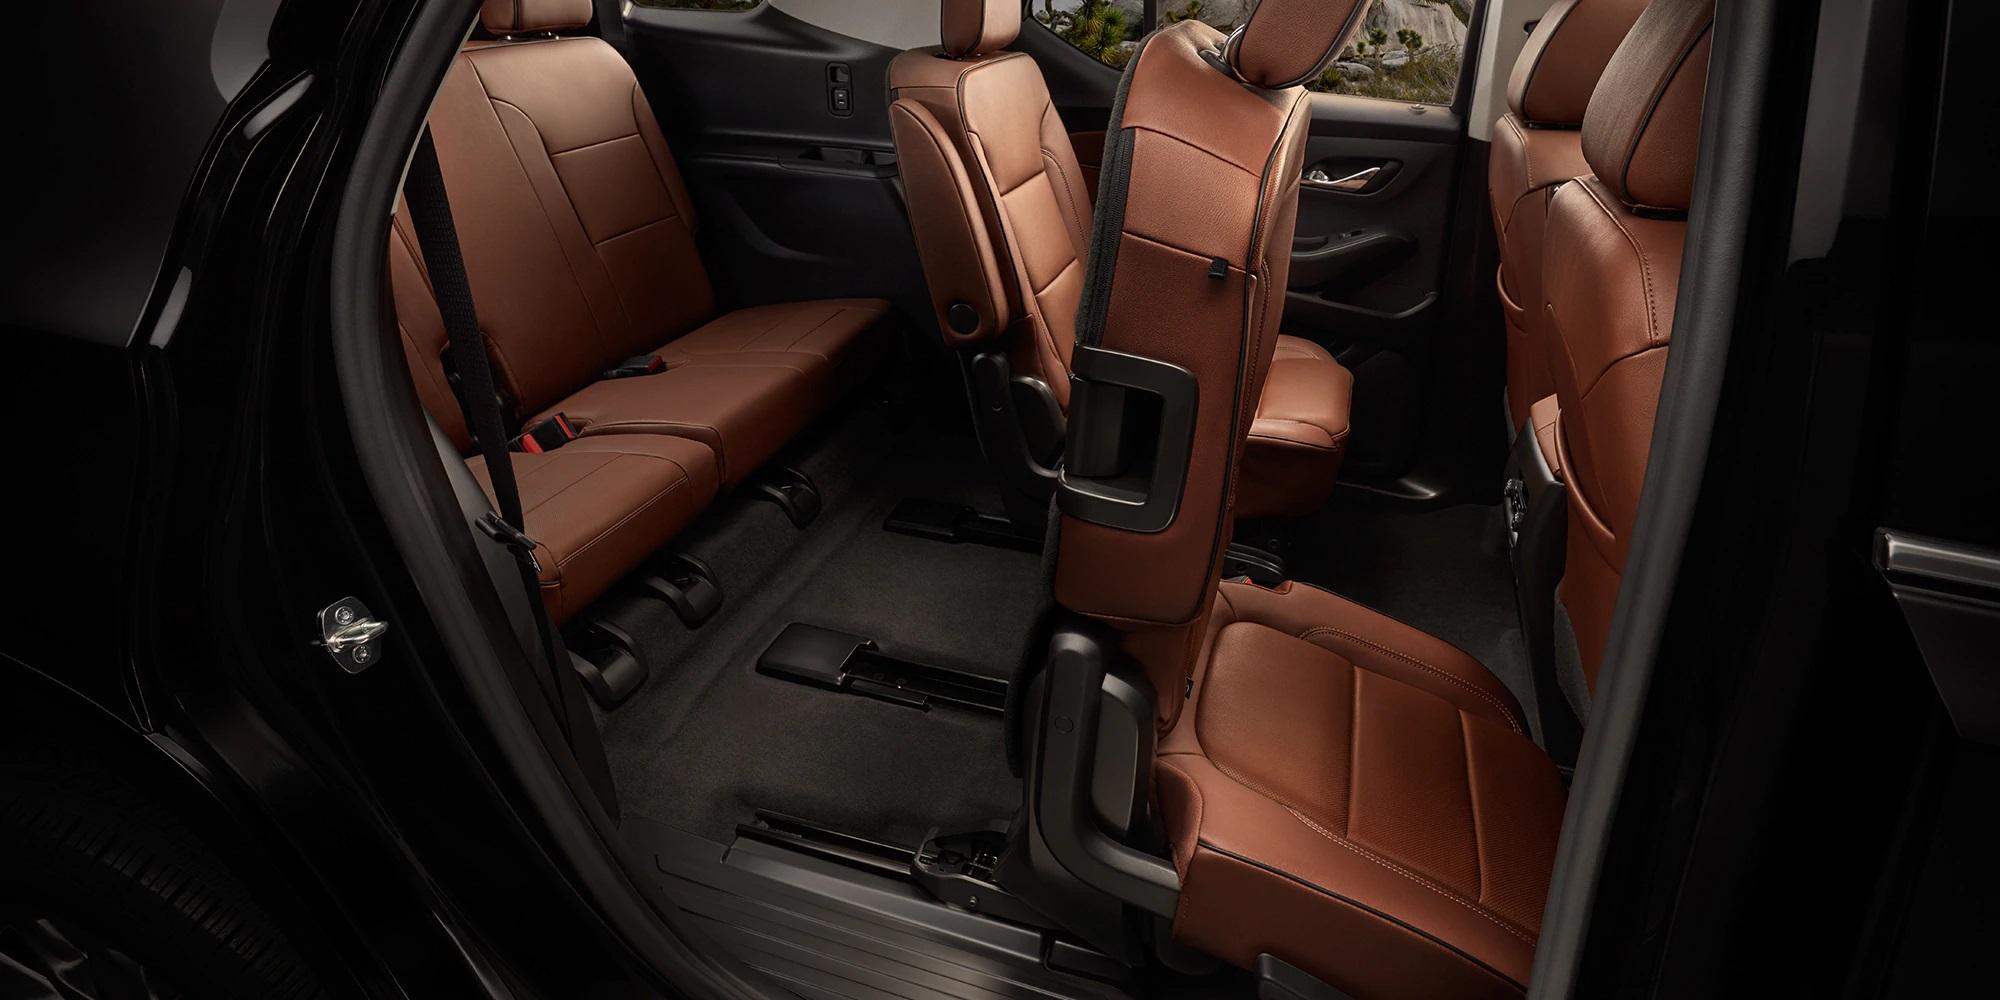 2020 Chevrolet Traverse Seating